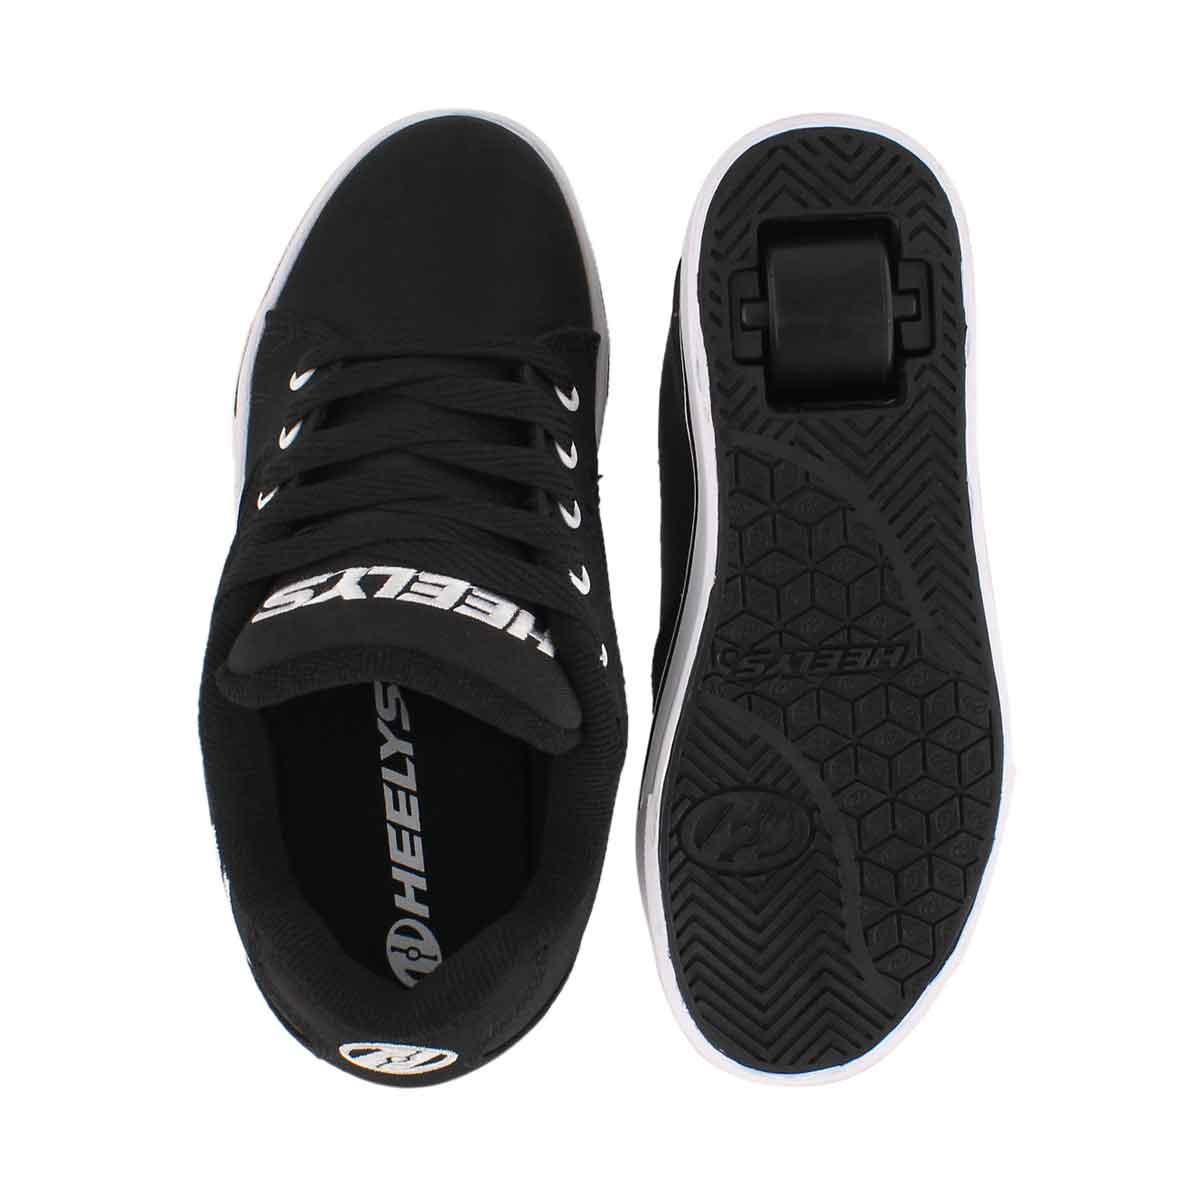 Bys Vopel black/white skate sneaker